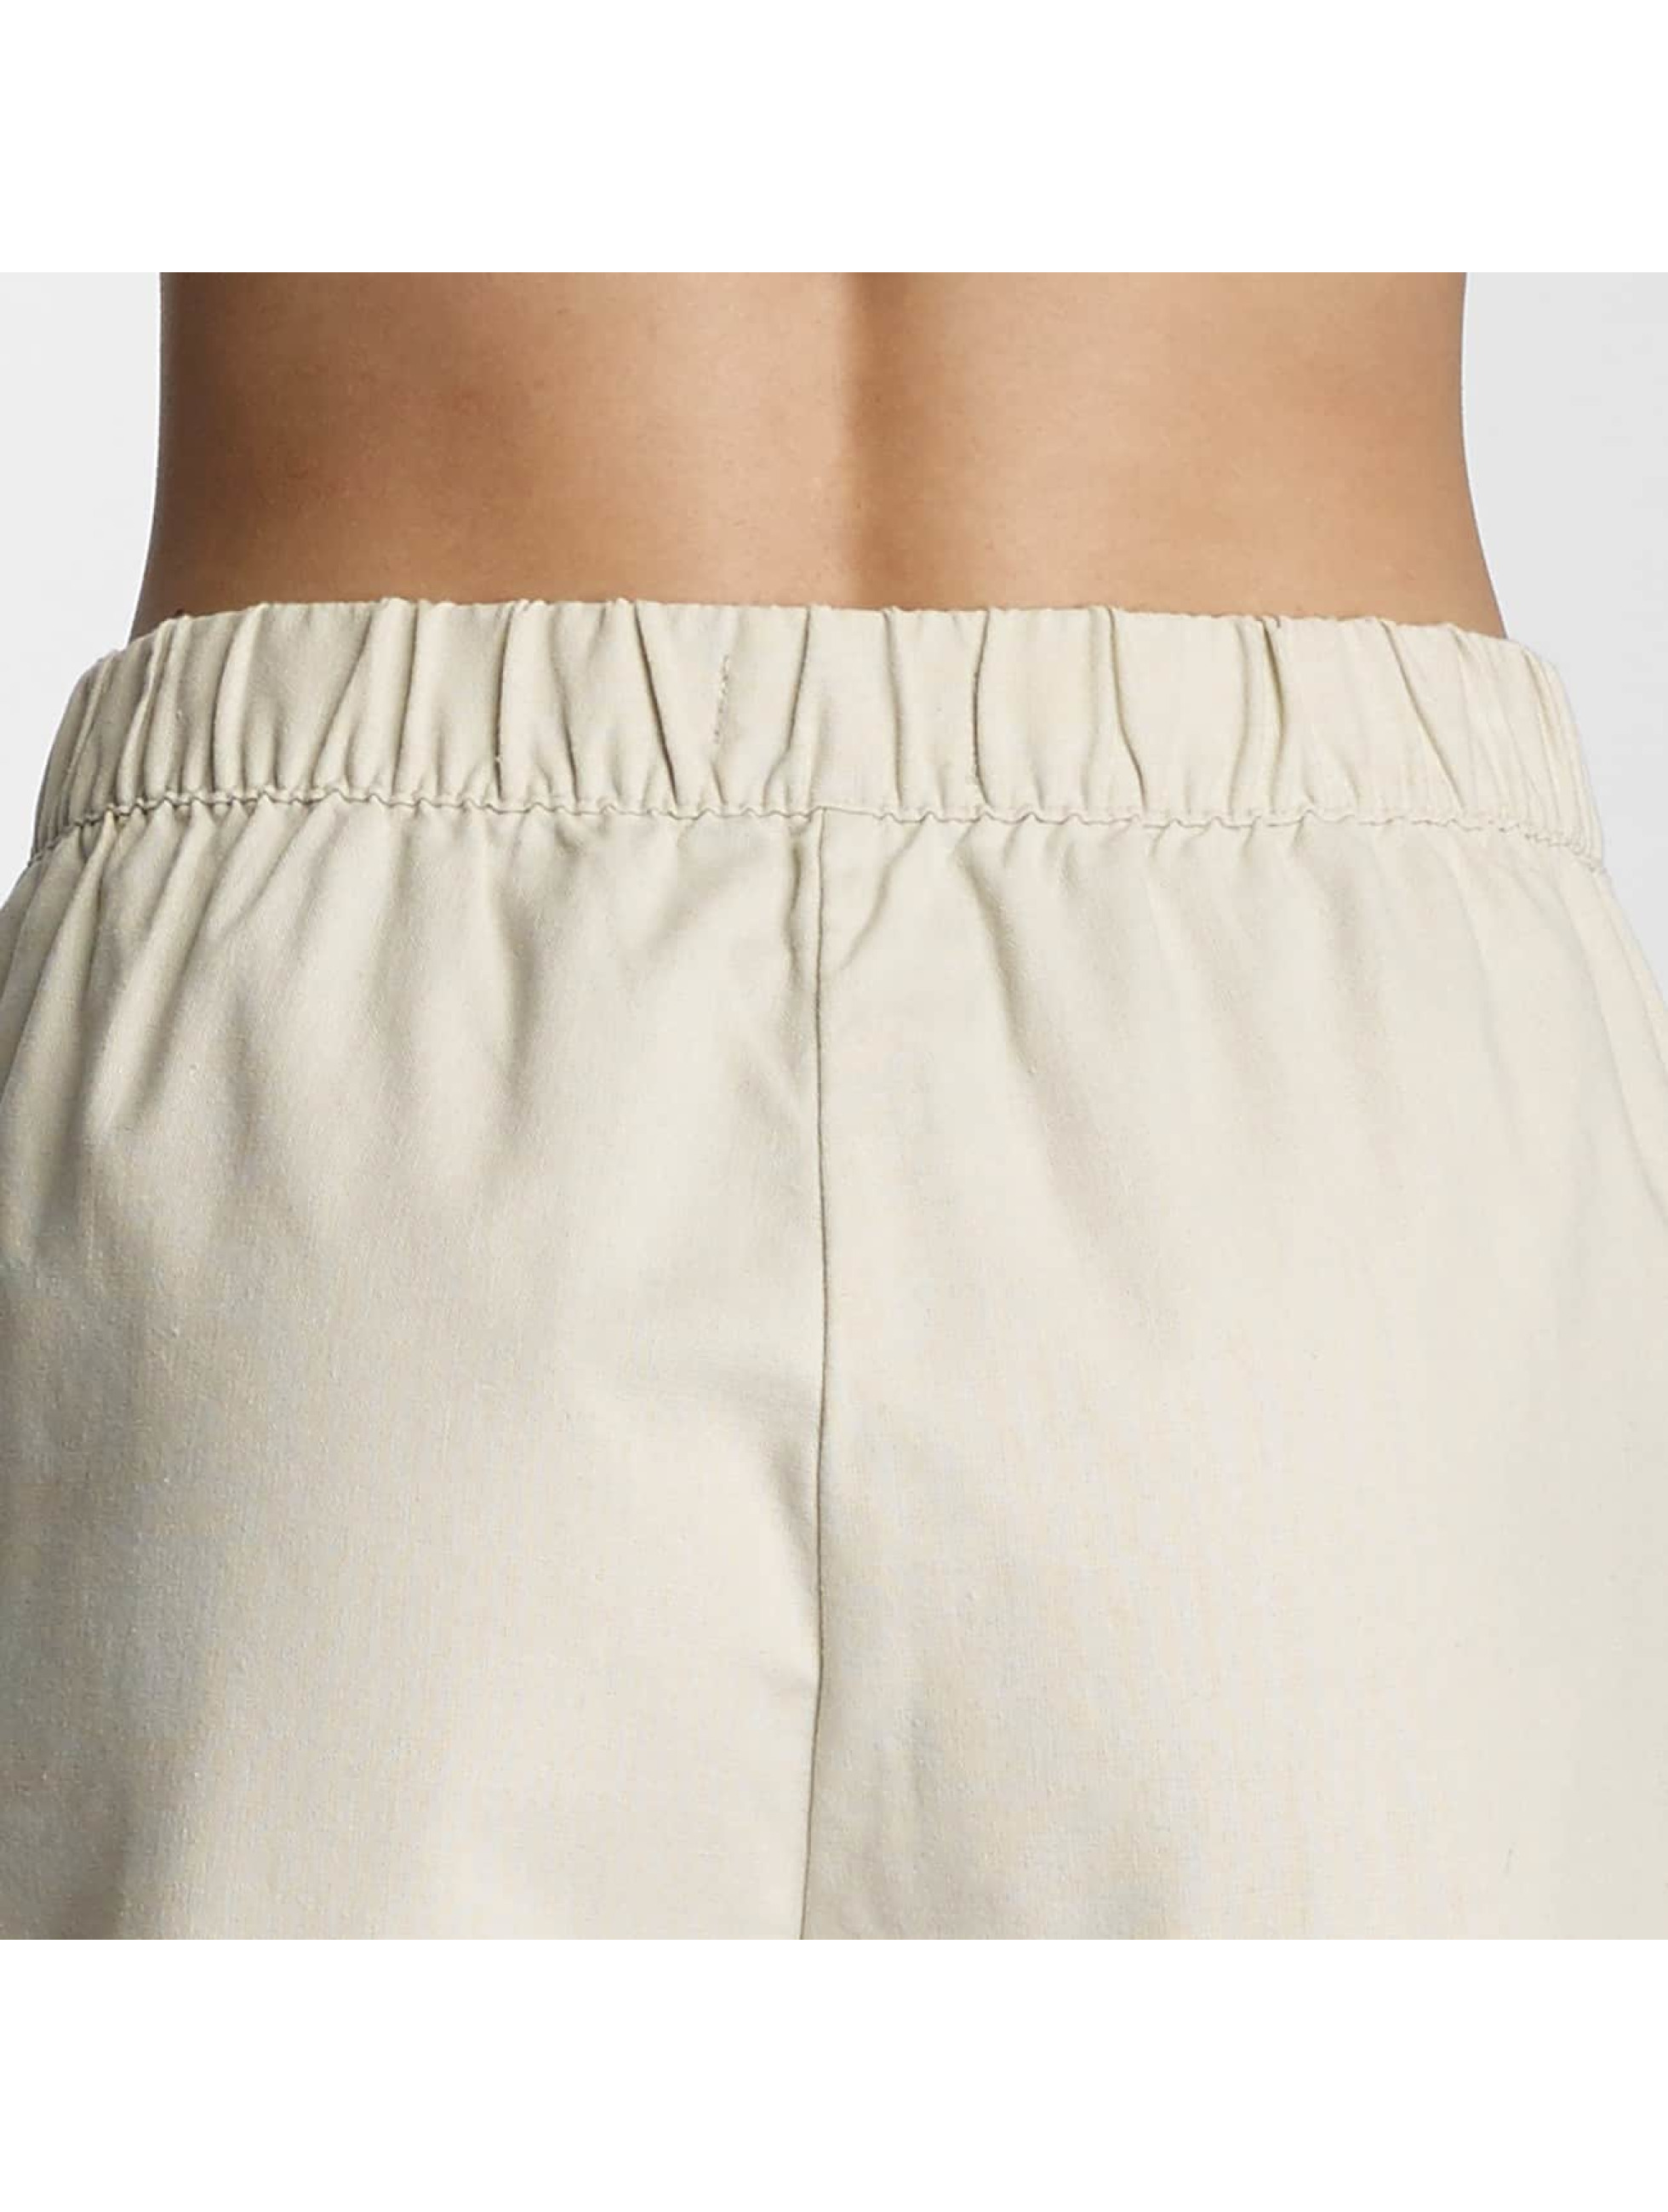 Vero Moda Short VMMilo beige